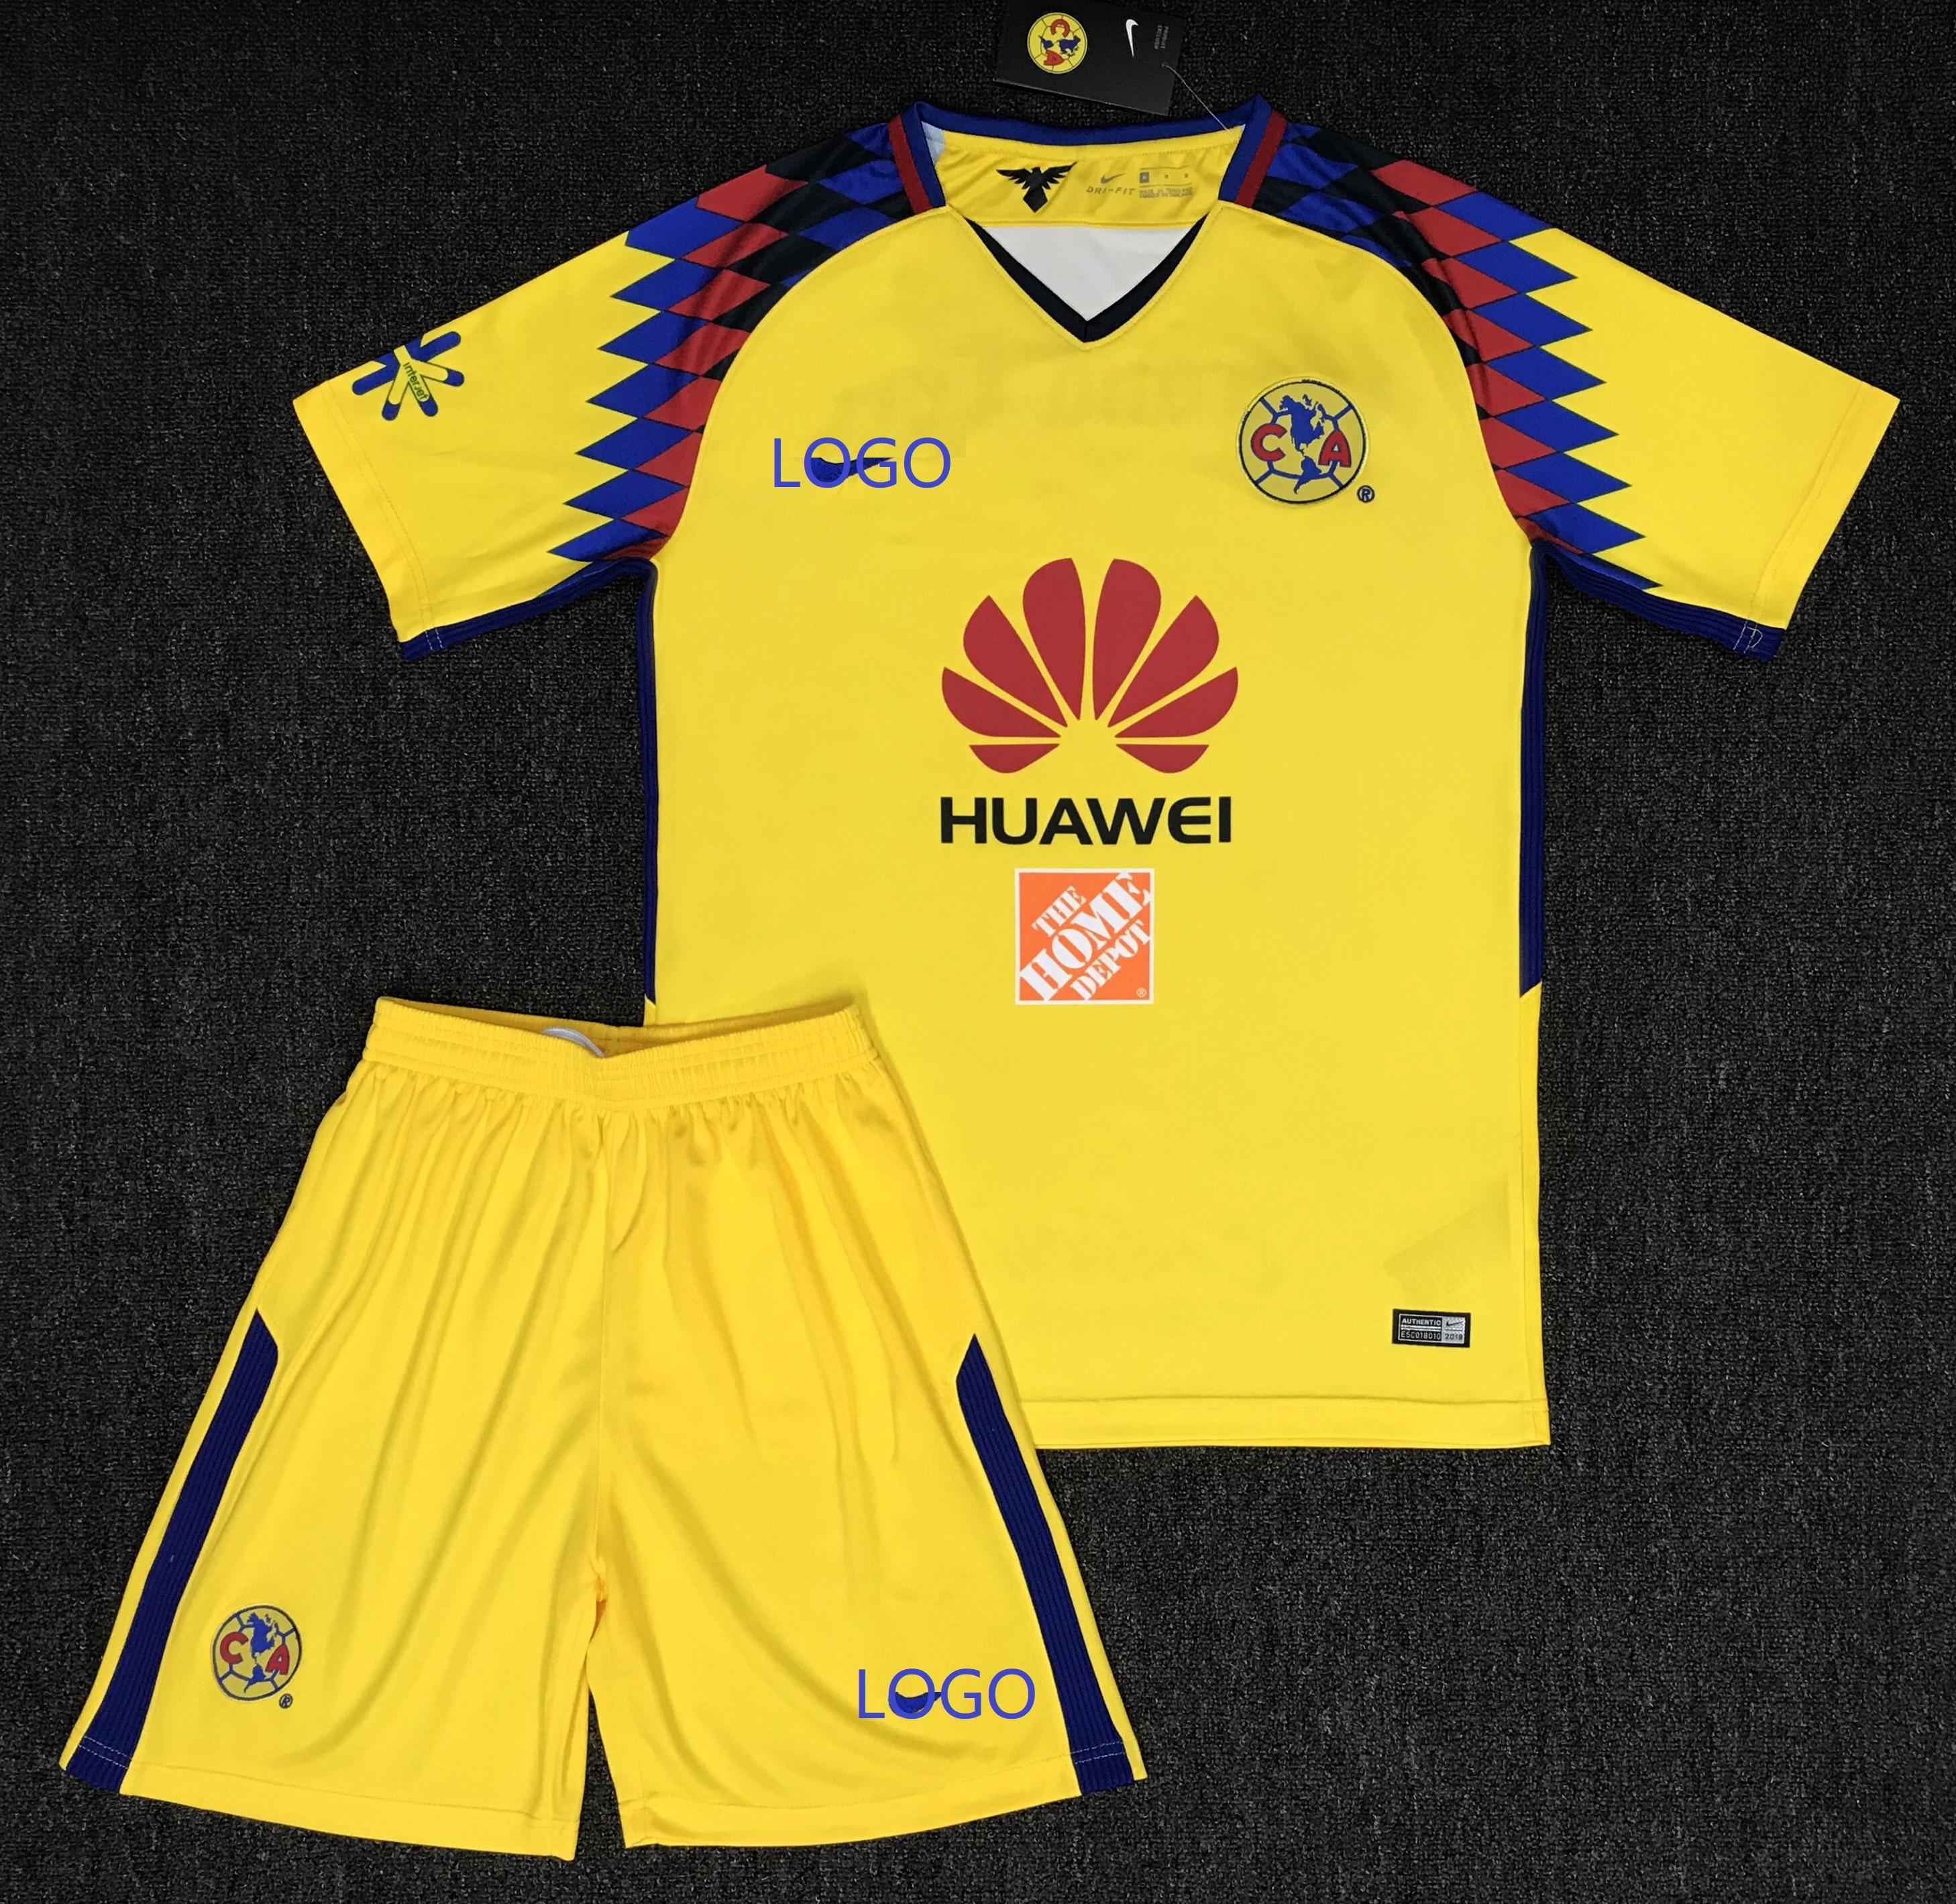 new arrival 5a363 cf68f 2018 Adult America Aguilas Camiseta de futbol Third Away Mexican League  soccer jerseys set Men Football Kits